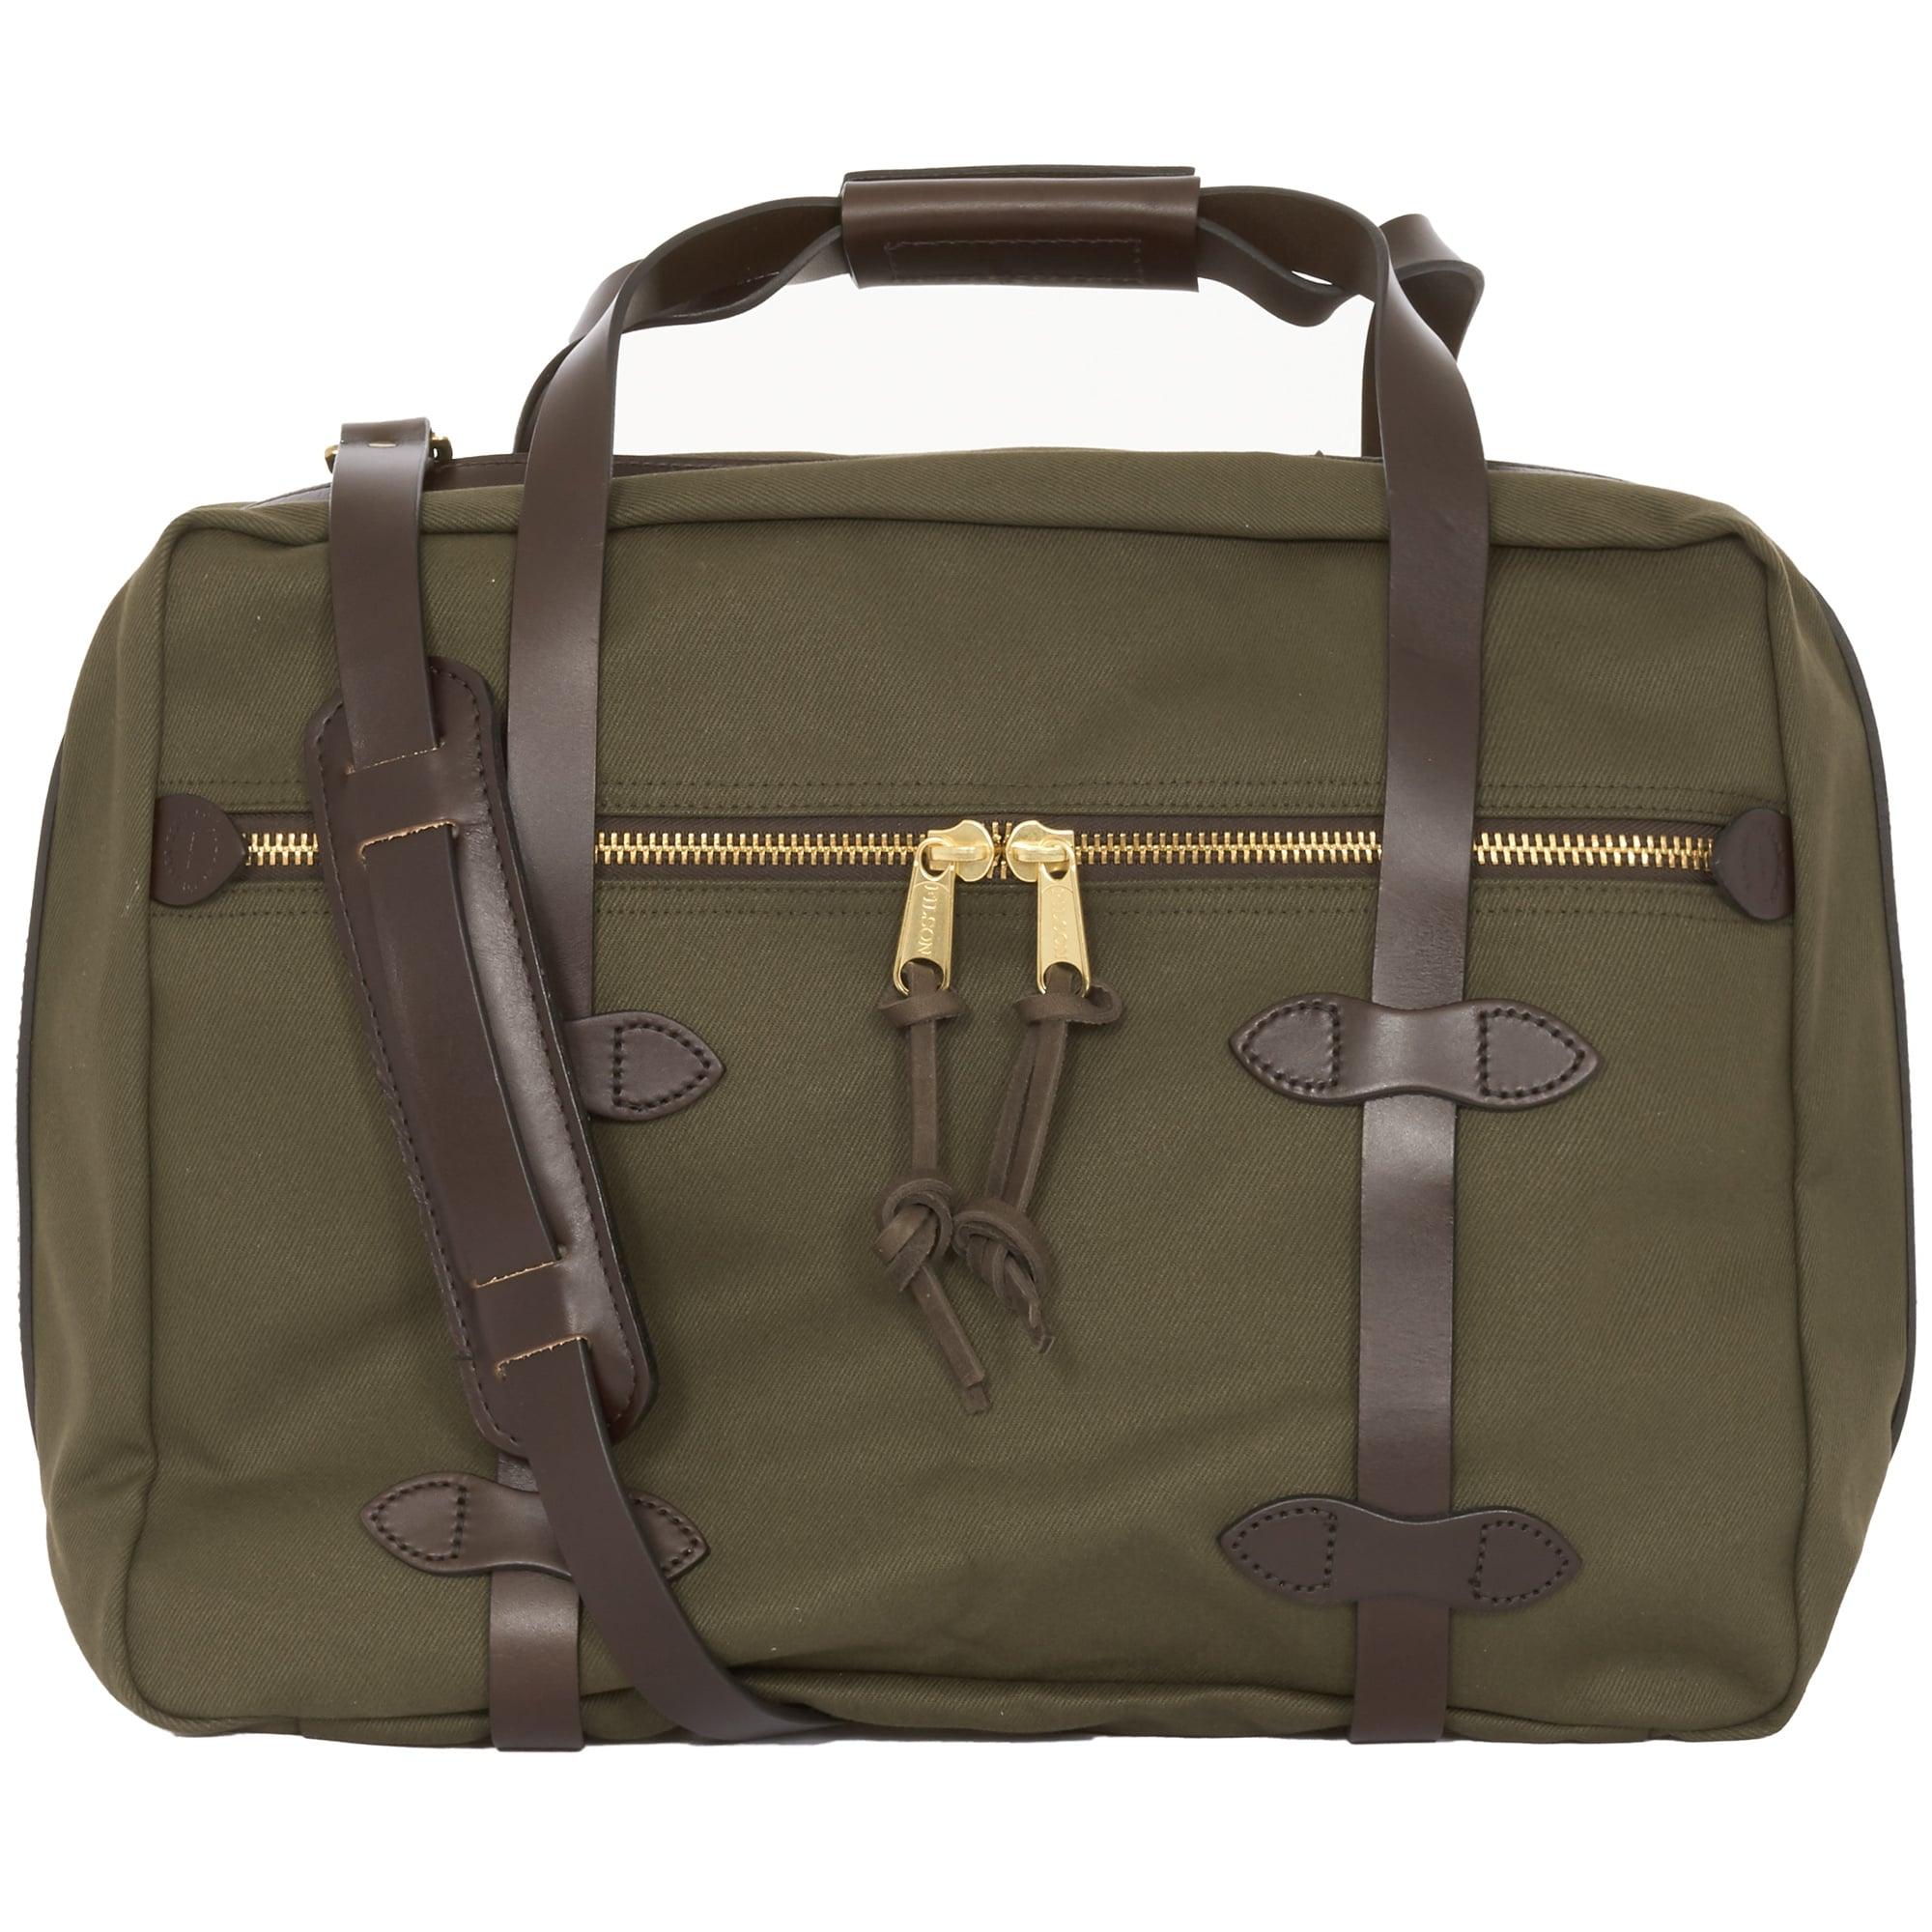 3b8e128c10c5 Filson Otter Green Small Pullman Bag